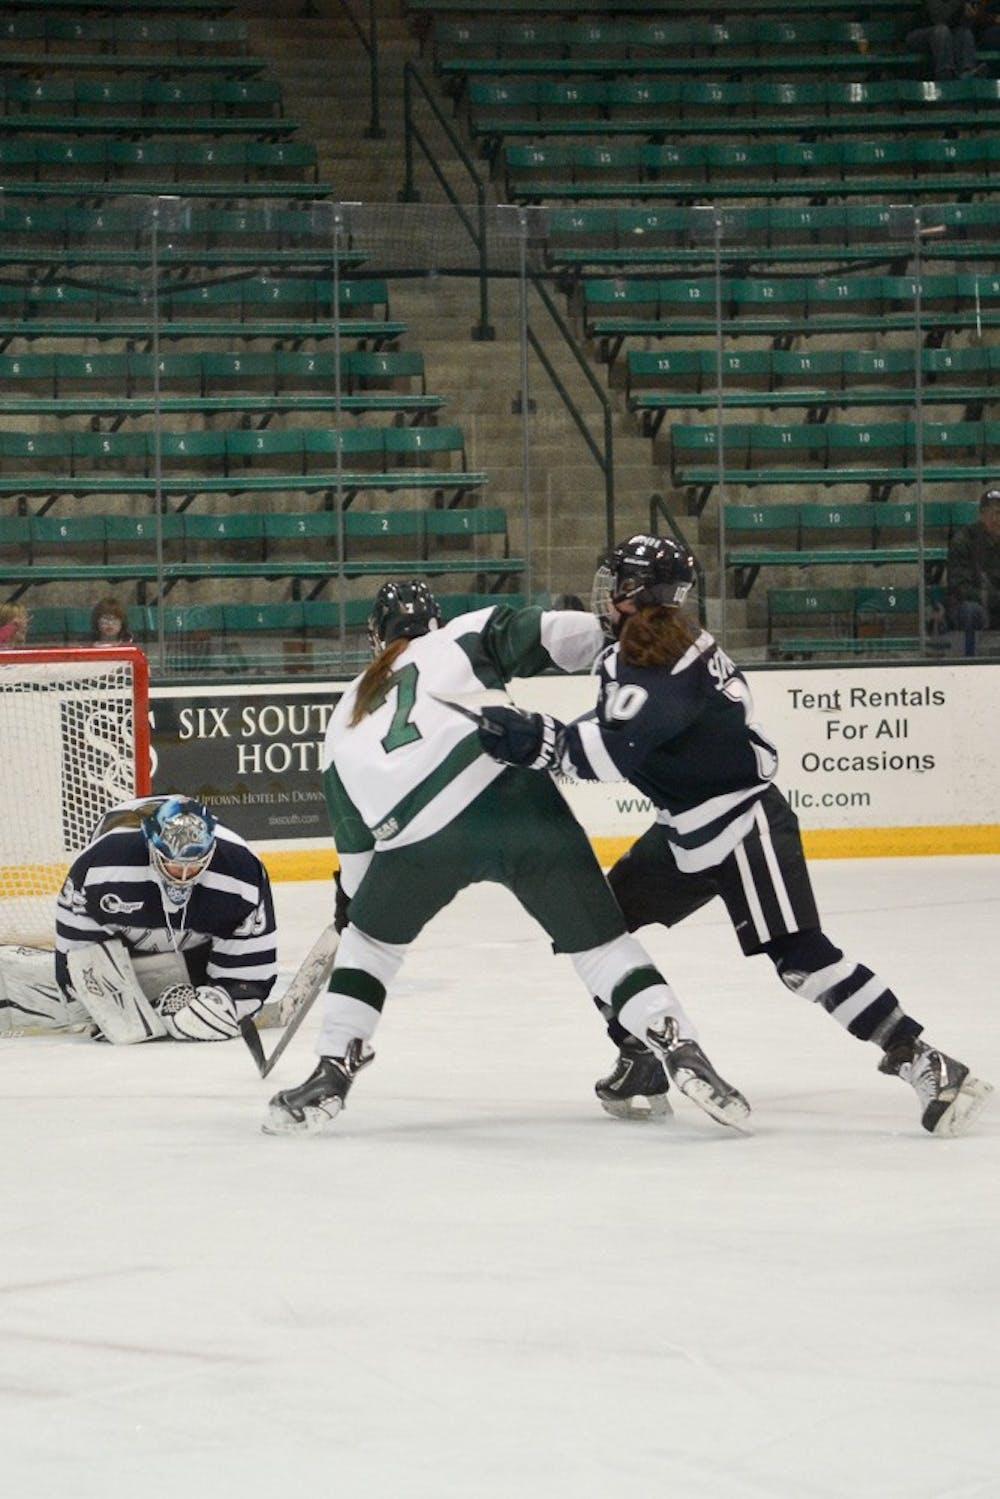 10-29-14-sports-hockey2-eliza-mcdonough